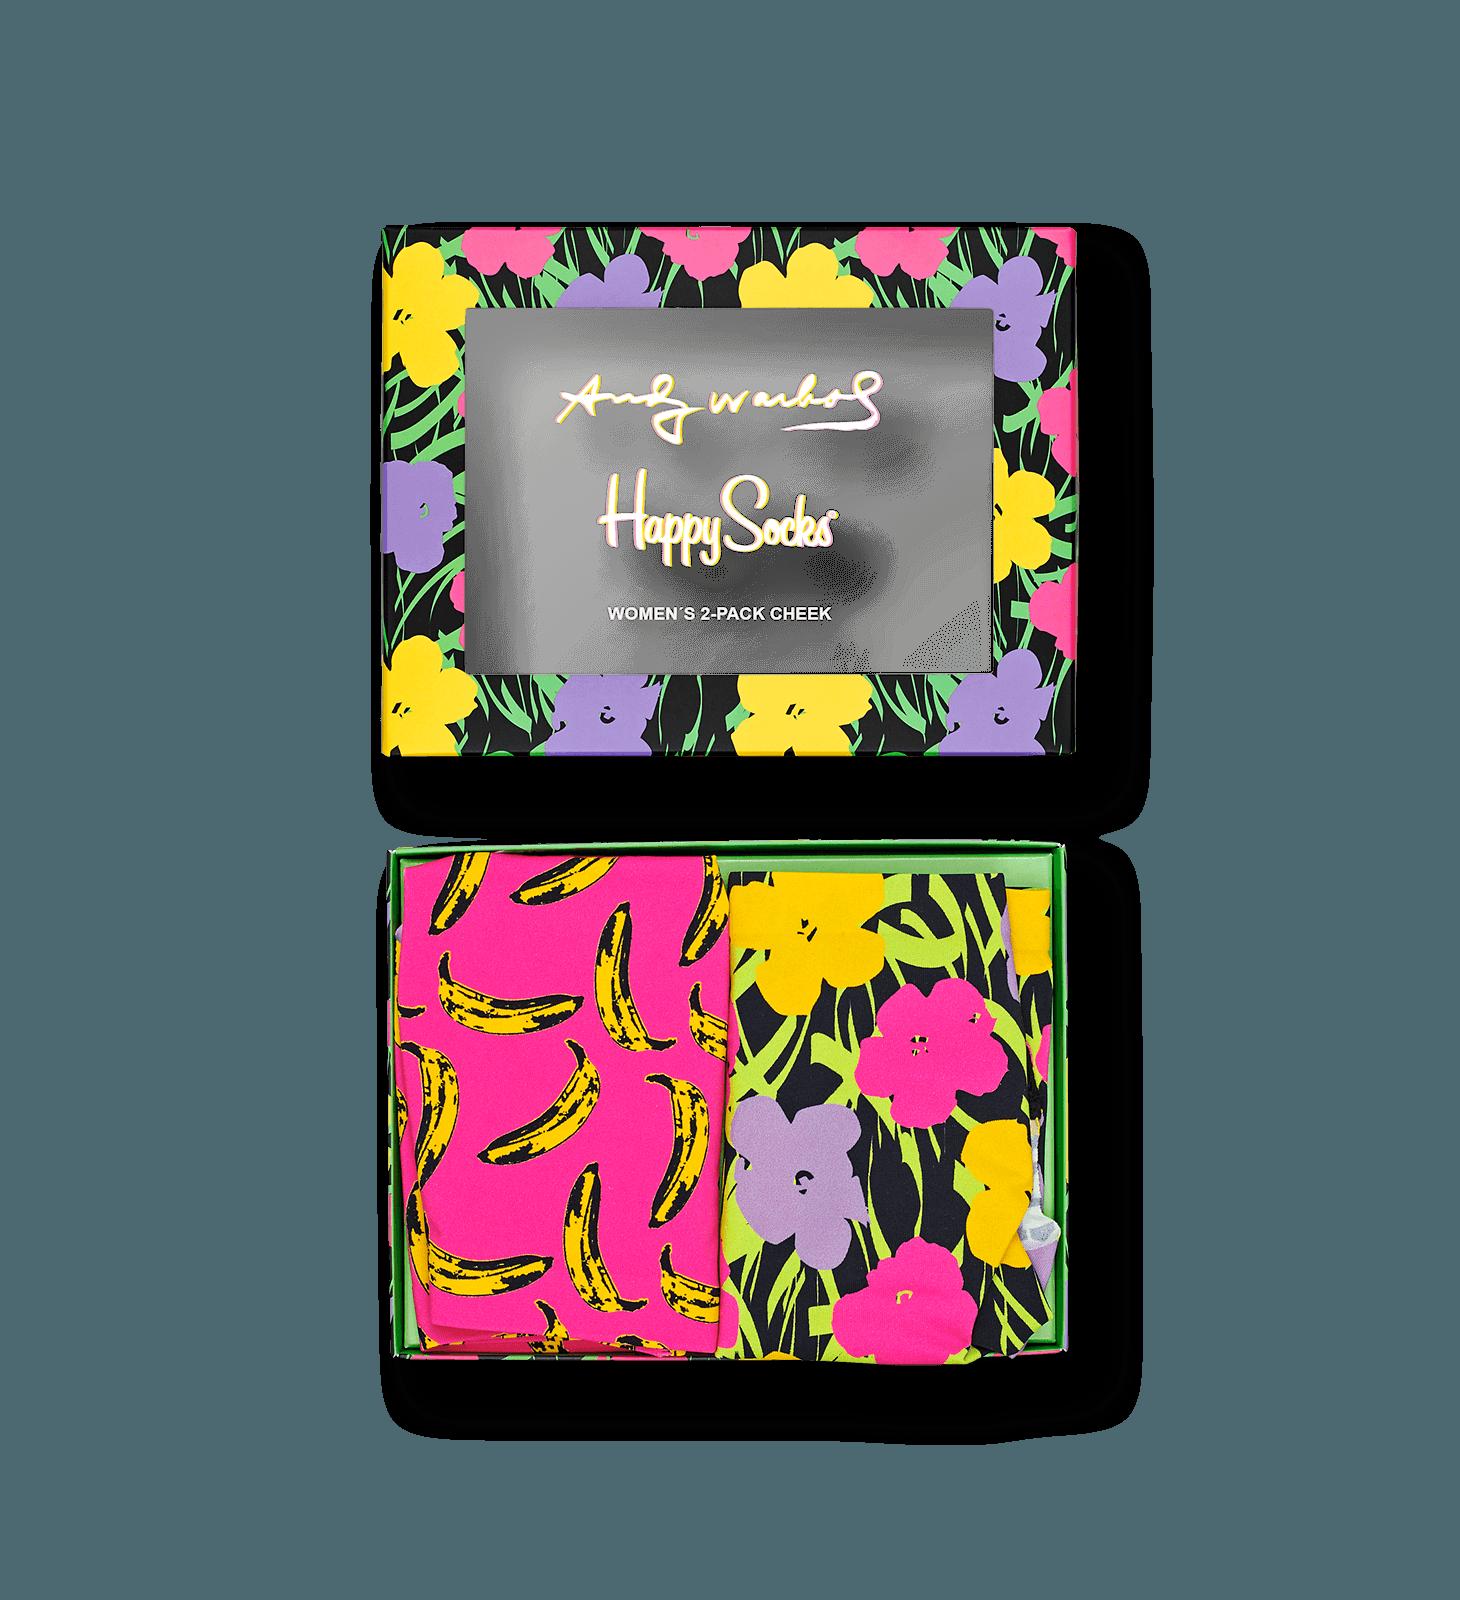 2-Pack Andy Warhol Cheeky Box Set